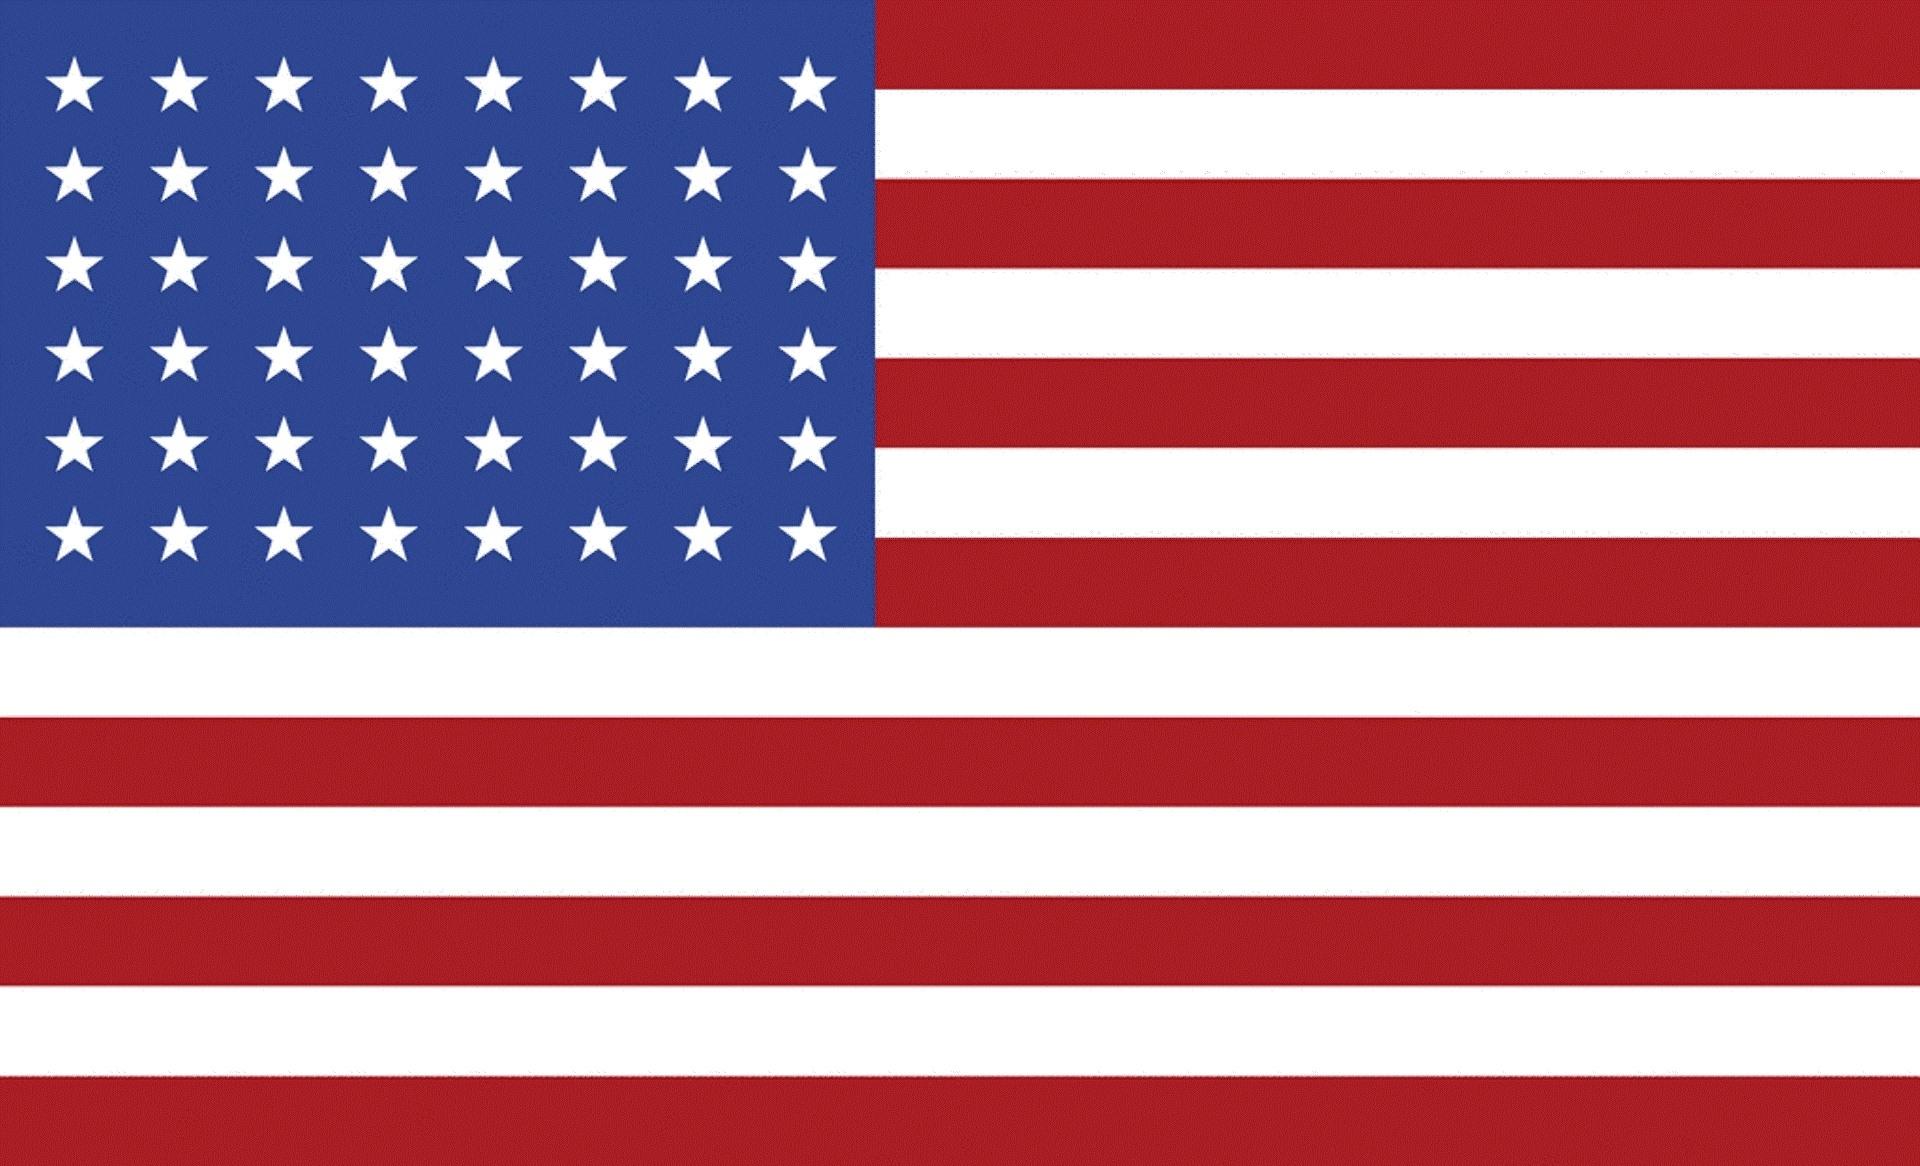 american flag wallpaper hd free download (13) - wallpaper.wiki